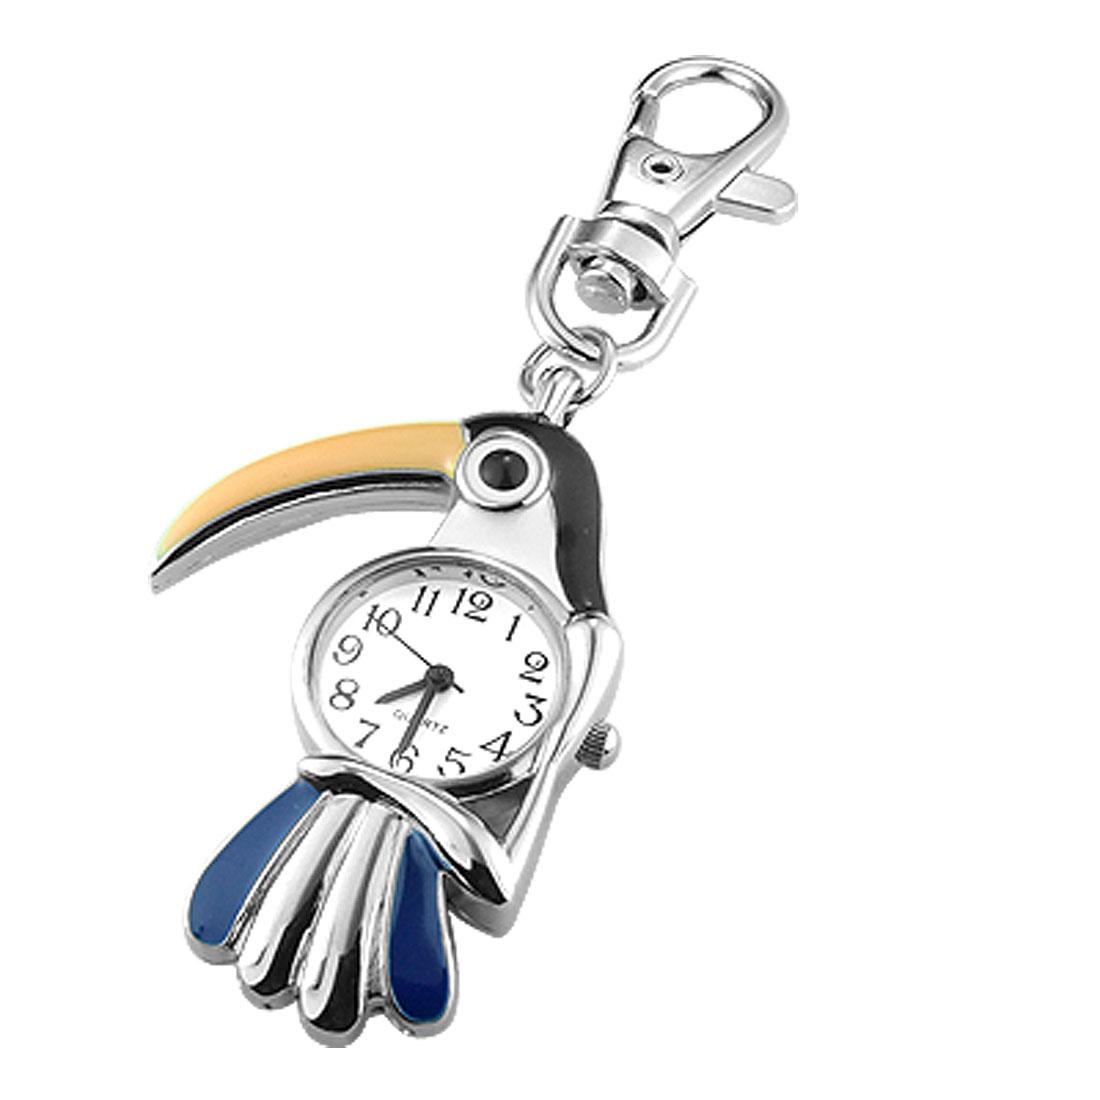 Woodpecker Round Watch Pendant Keychain Keyring